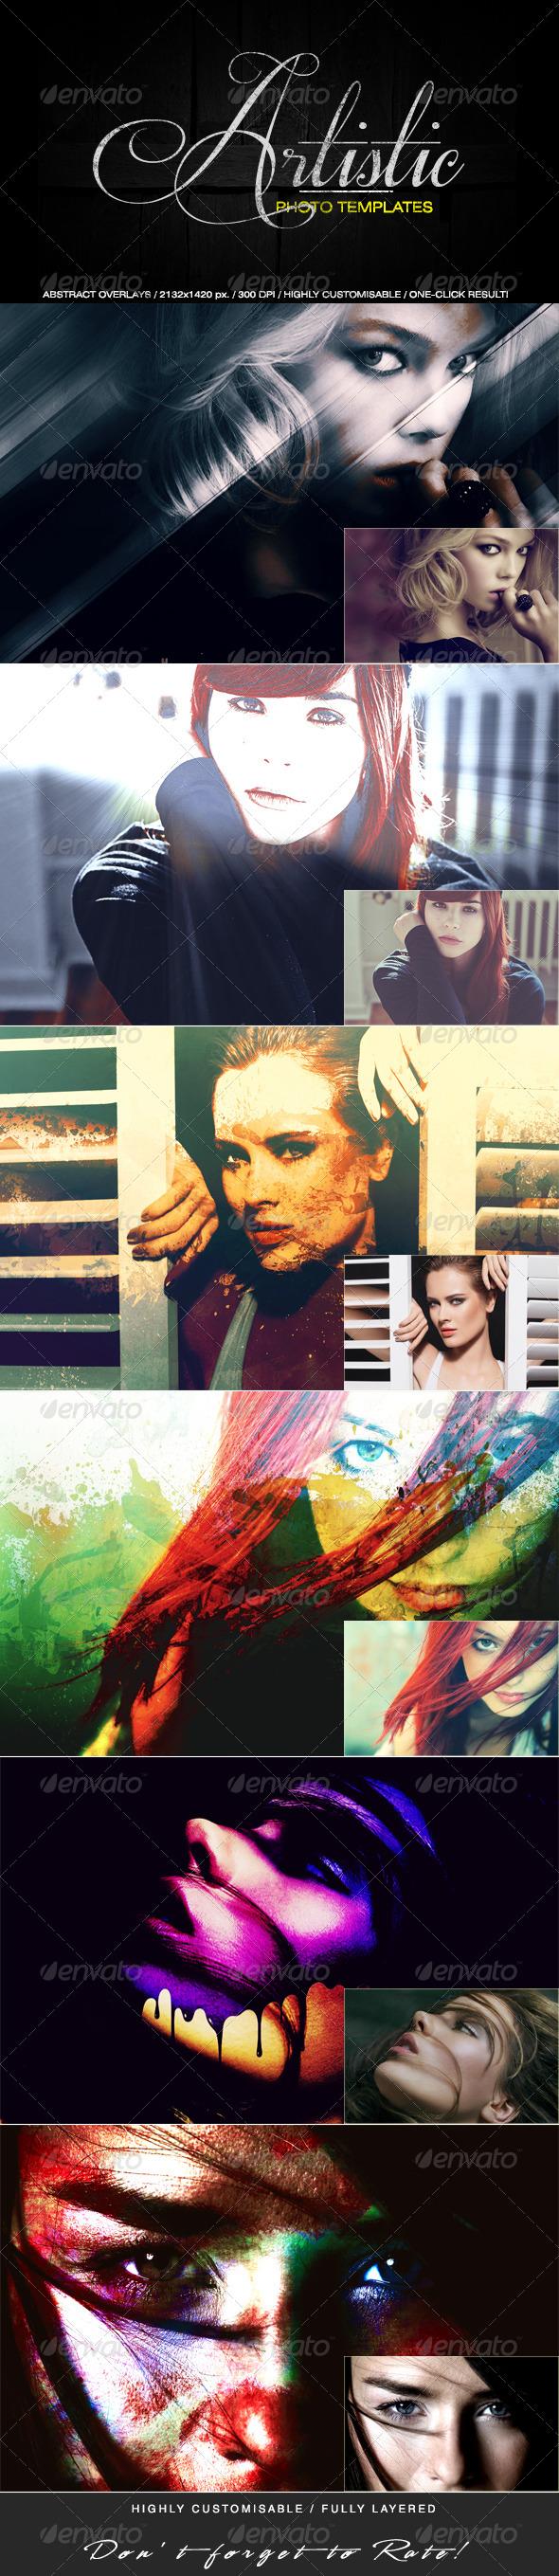 Artistic Photo Templates - Artistic Photo Templates